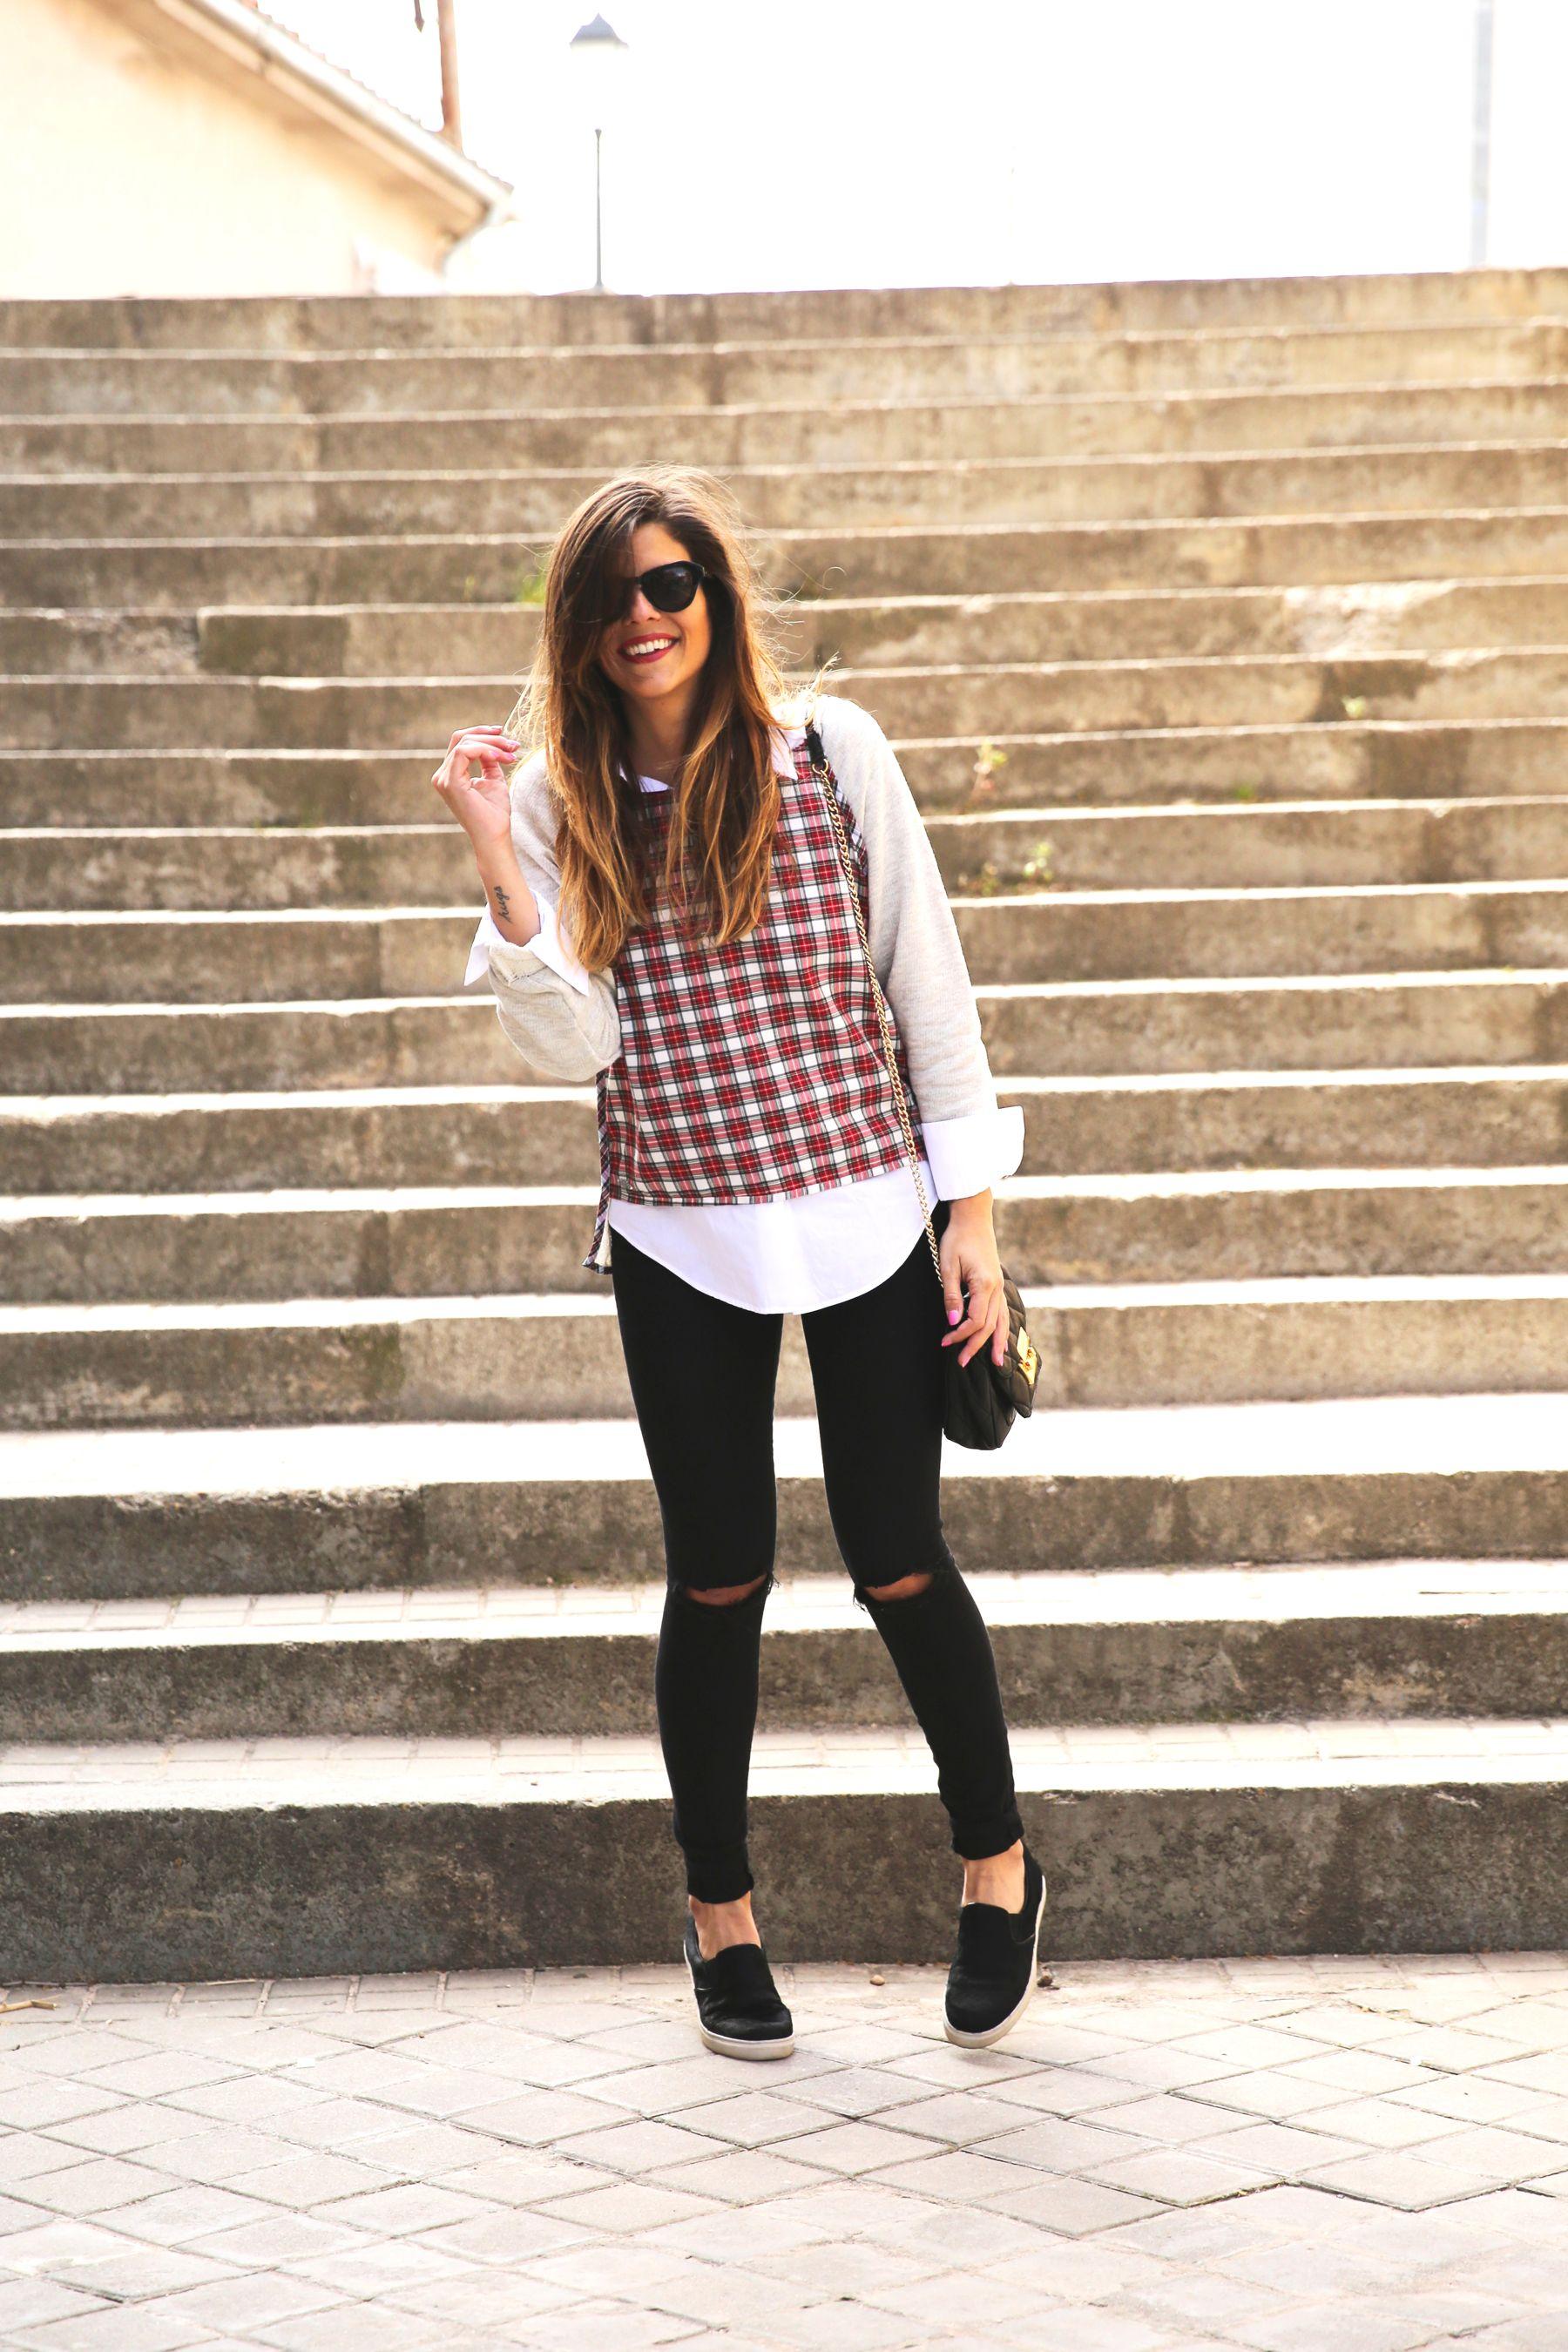 trendy_taste-look-outfit-street_style-ootd-blog-blogger-fashion-spain-moda-españa-steve-madden-plaid-shirt-camisa-cuadros-skinny-jeans-pitillos-negros-5